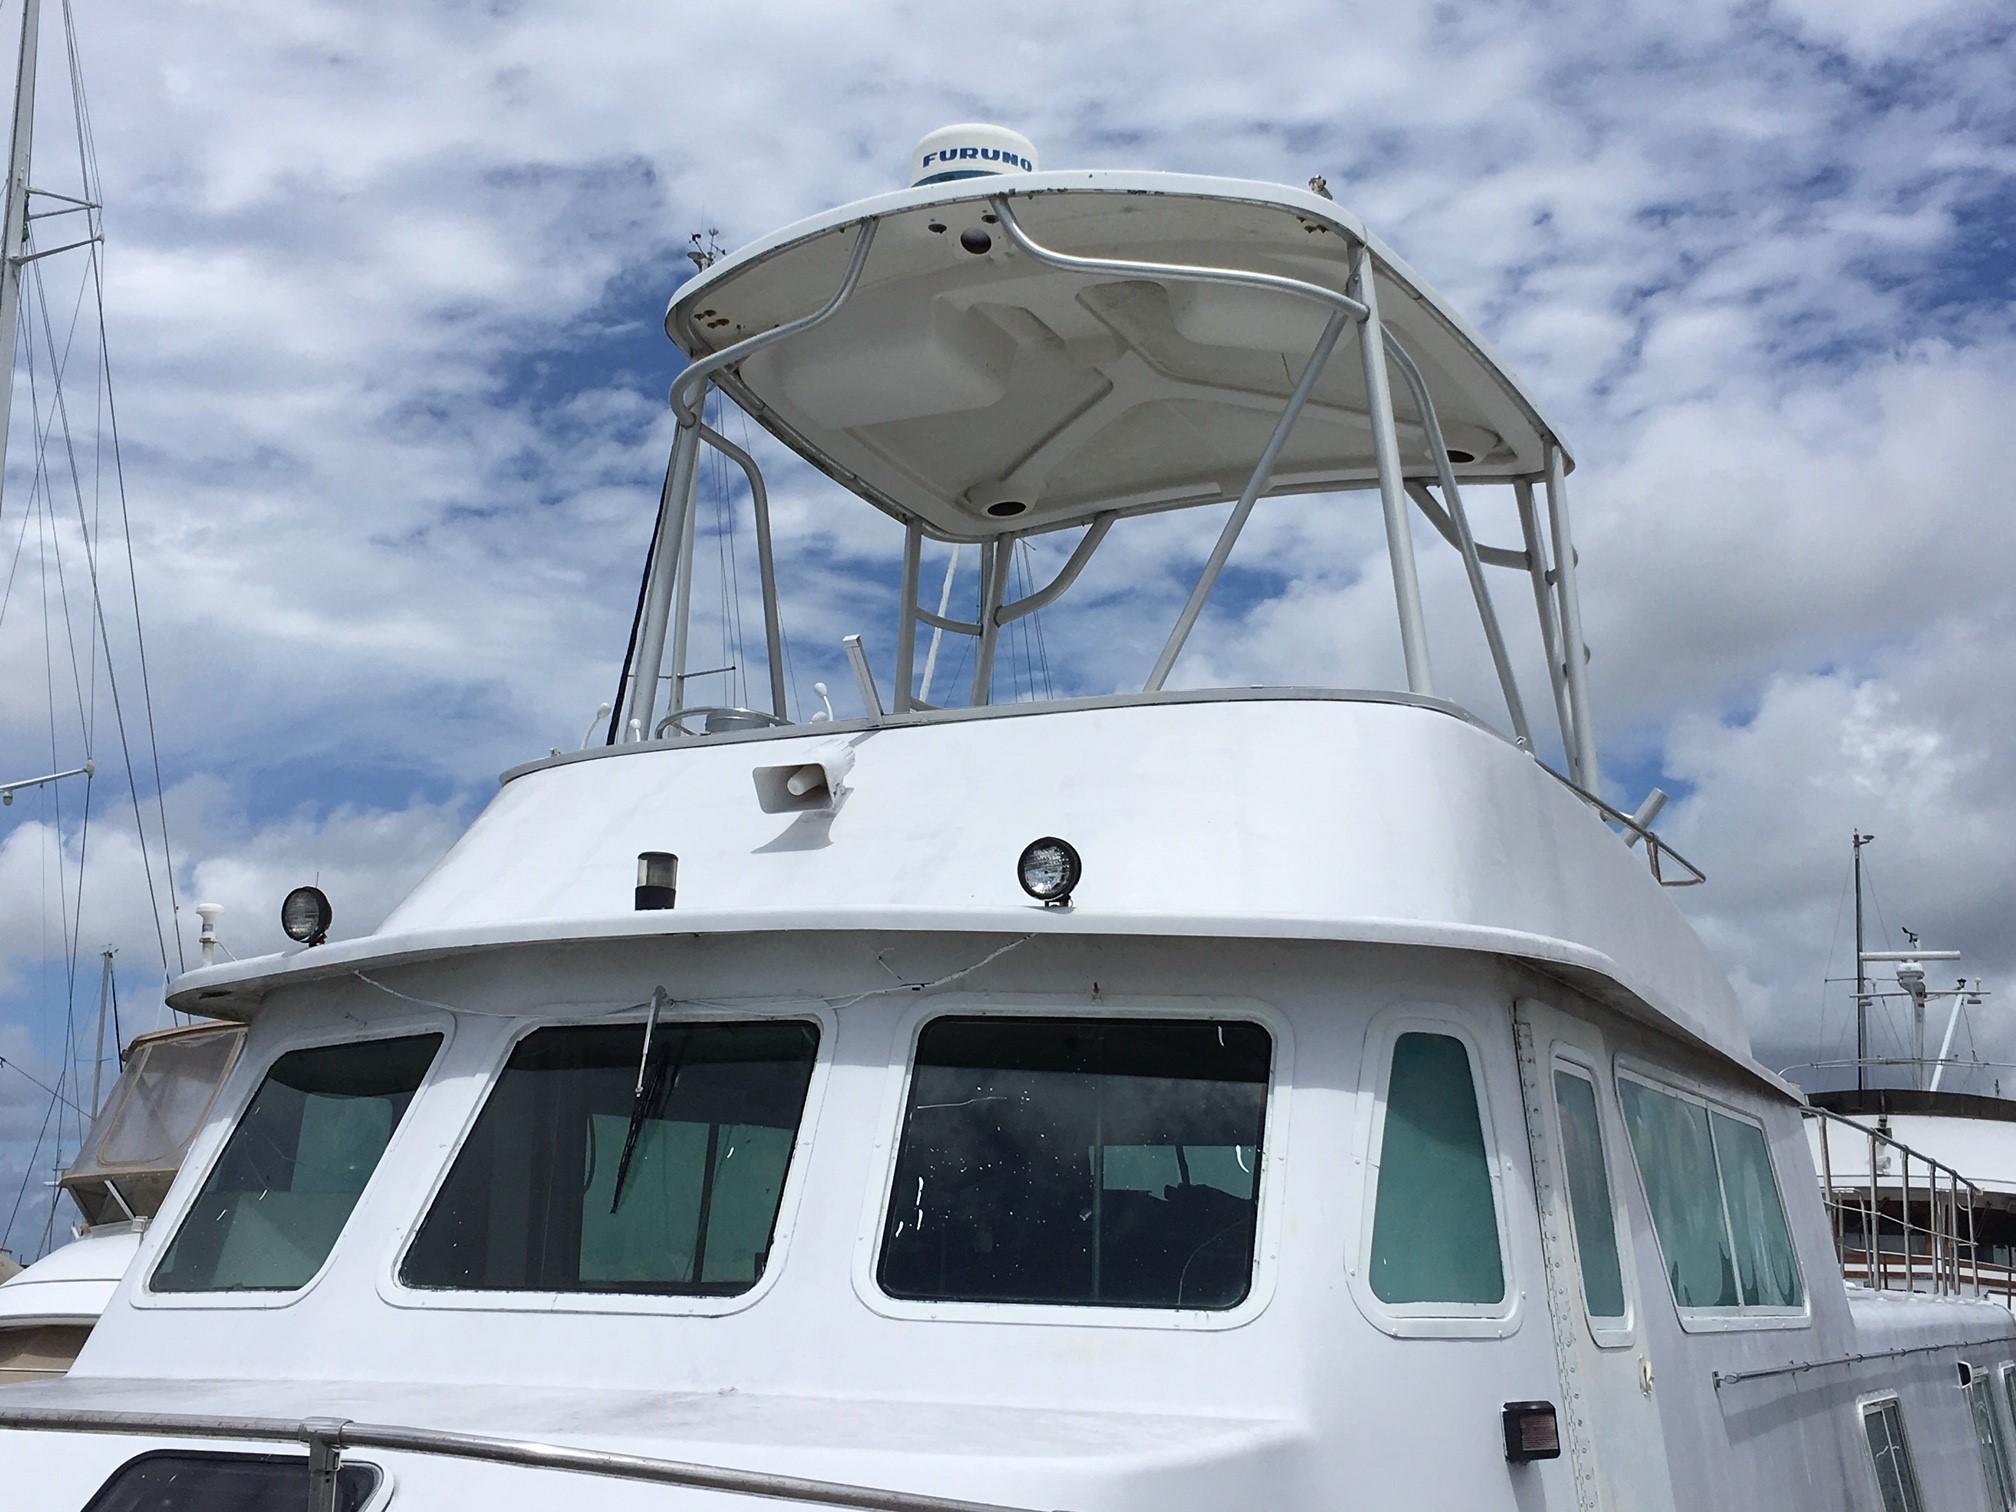 Carri-craft 57-ft Power Catamaran - carri-craft helm windows and upper helm